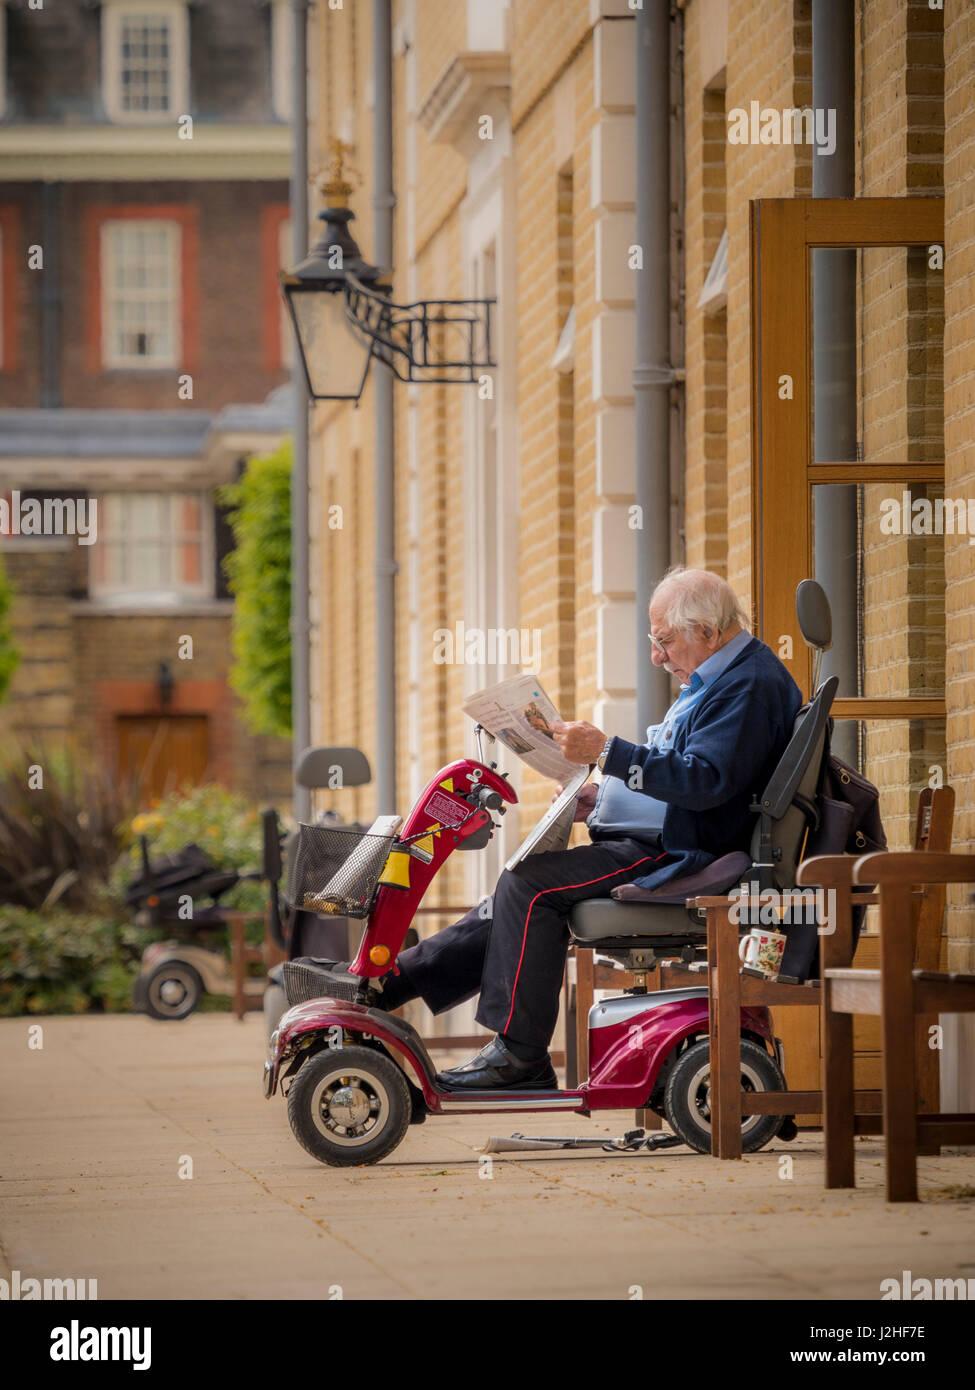 Chelsea Pensionär am Royal Hospital Chelsea saß auf Elektromobil außerhalb Wohnung lesen Zeitung, Stockbild